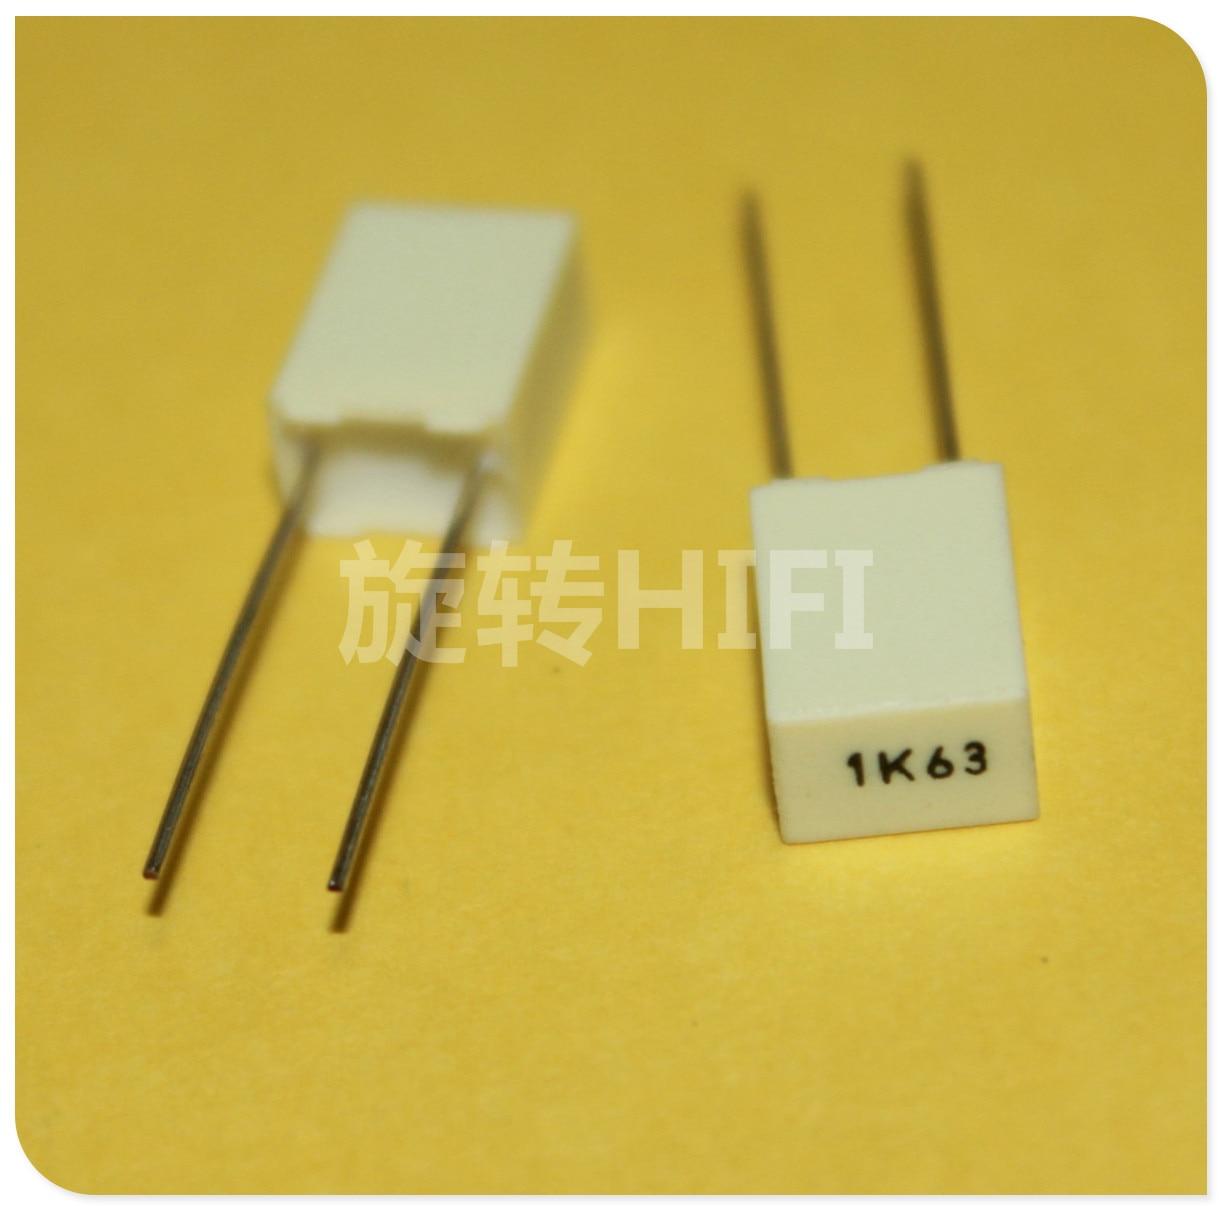 63V AVX BQ074D0105JDC 1uF Polyester Film Capacitor 5/% tolerance Radial 25pcs